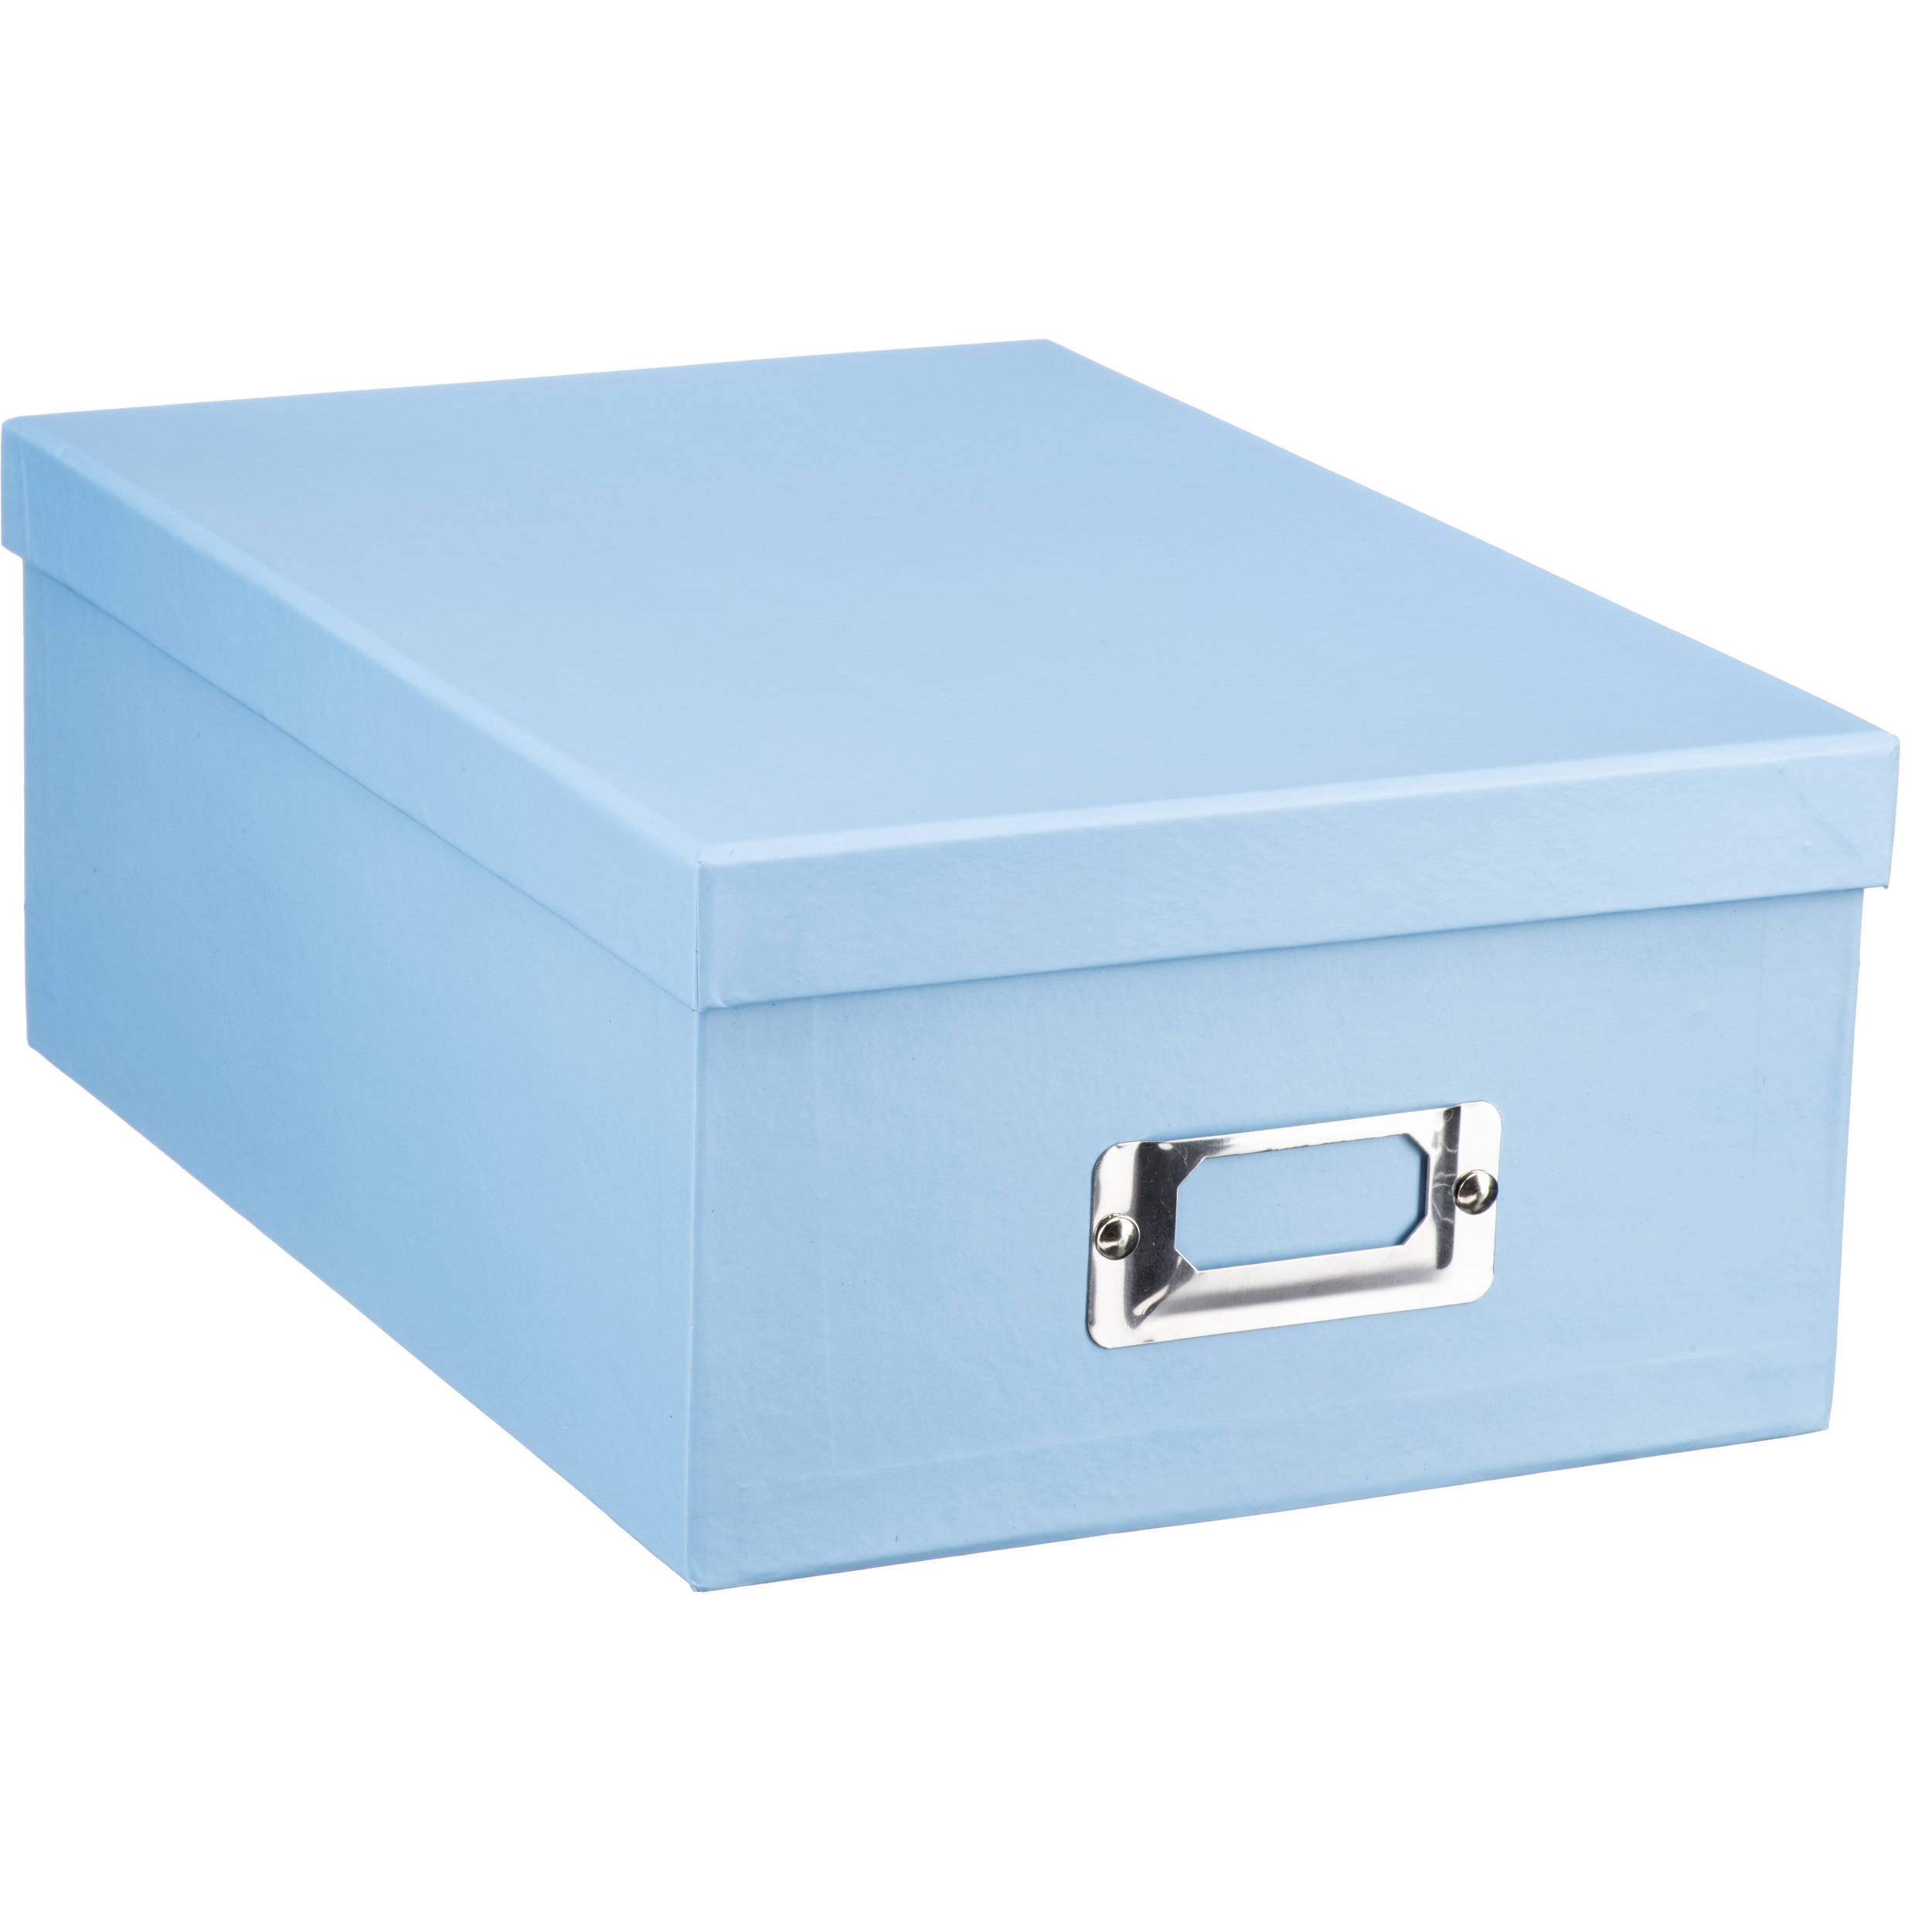 Attirant Pioneer Photo Albums Photo Storage Box (Sky Blue)